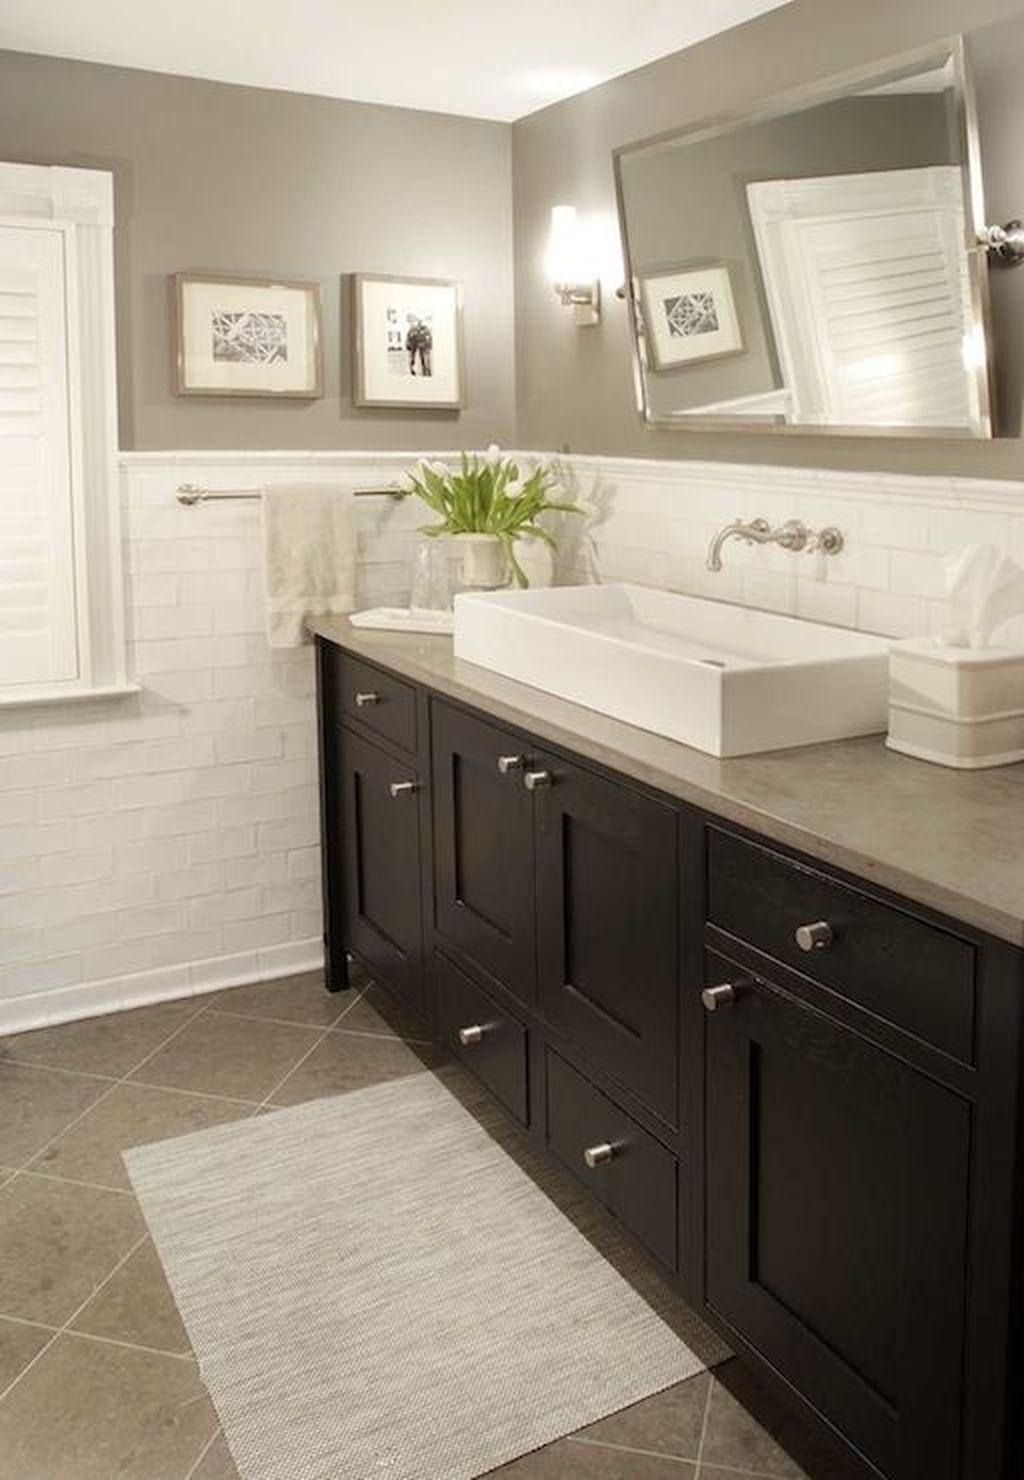 30 Popular Kitchen Color Scheme Ideas For Dark Cabinets Traditional Bathroom Bathroom Inspiration Bathroom Design